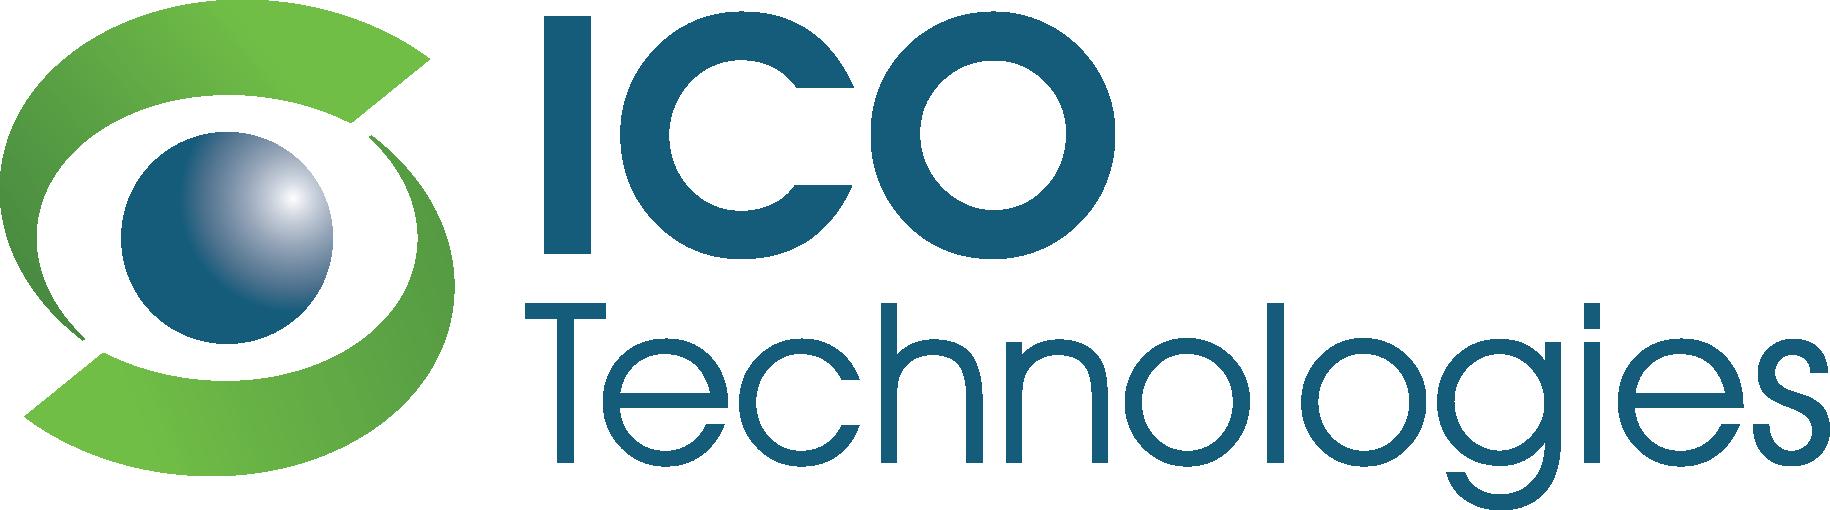 ICO Technologies